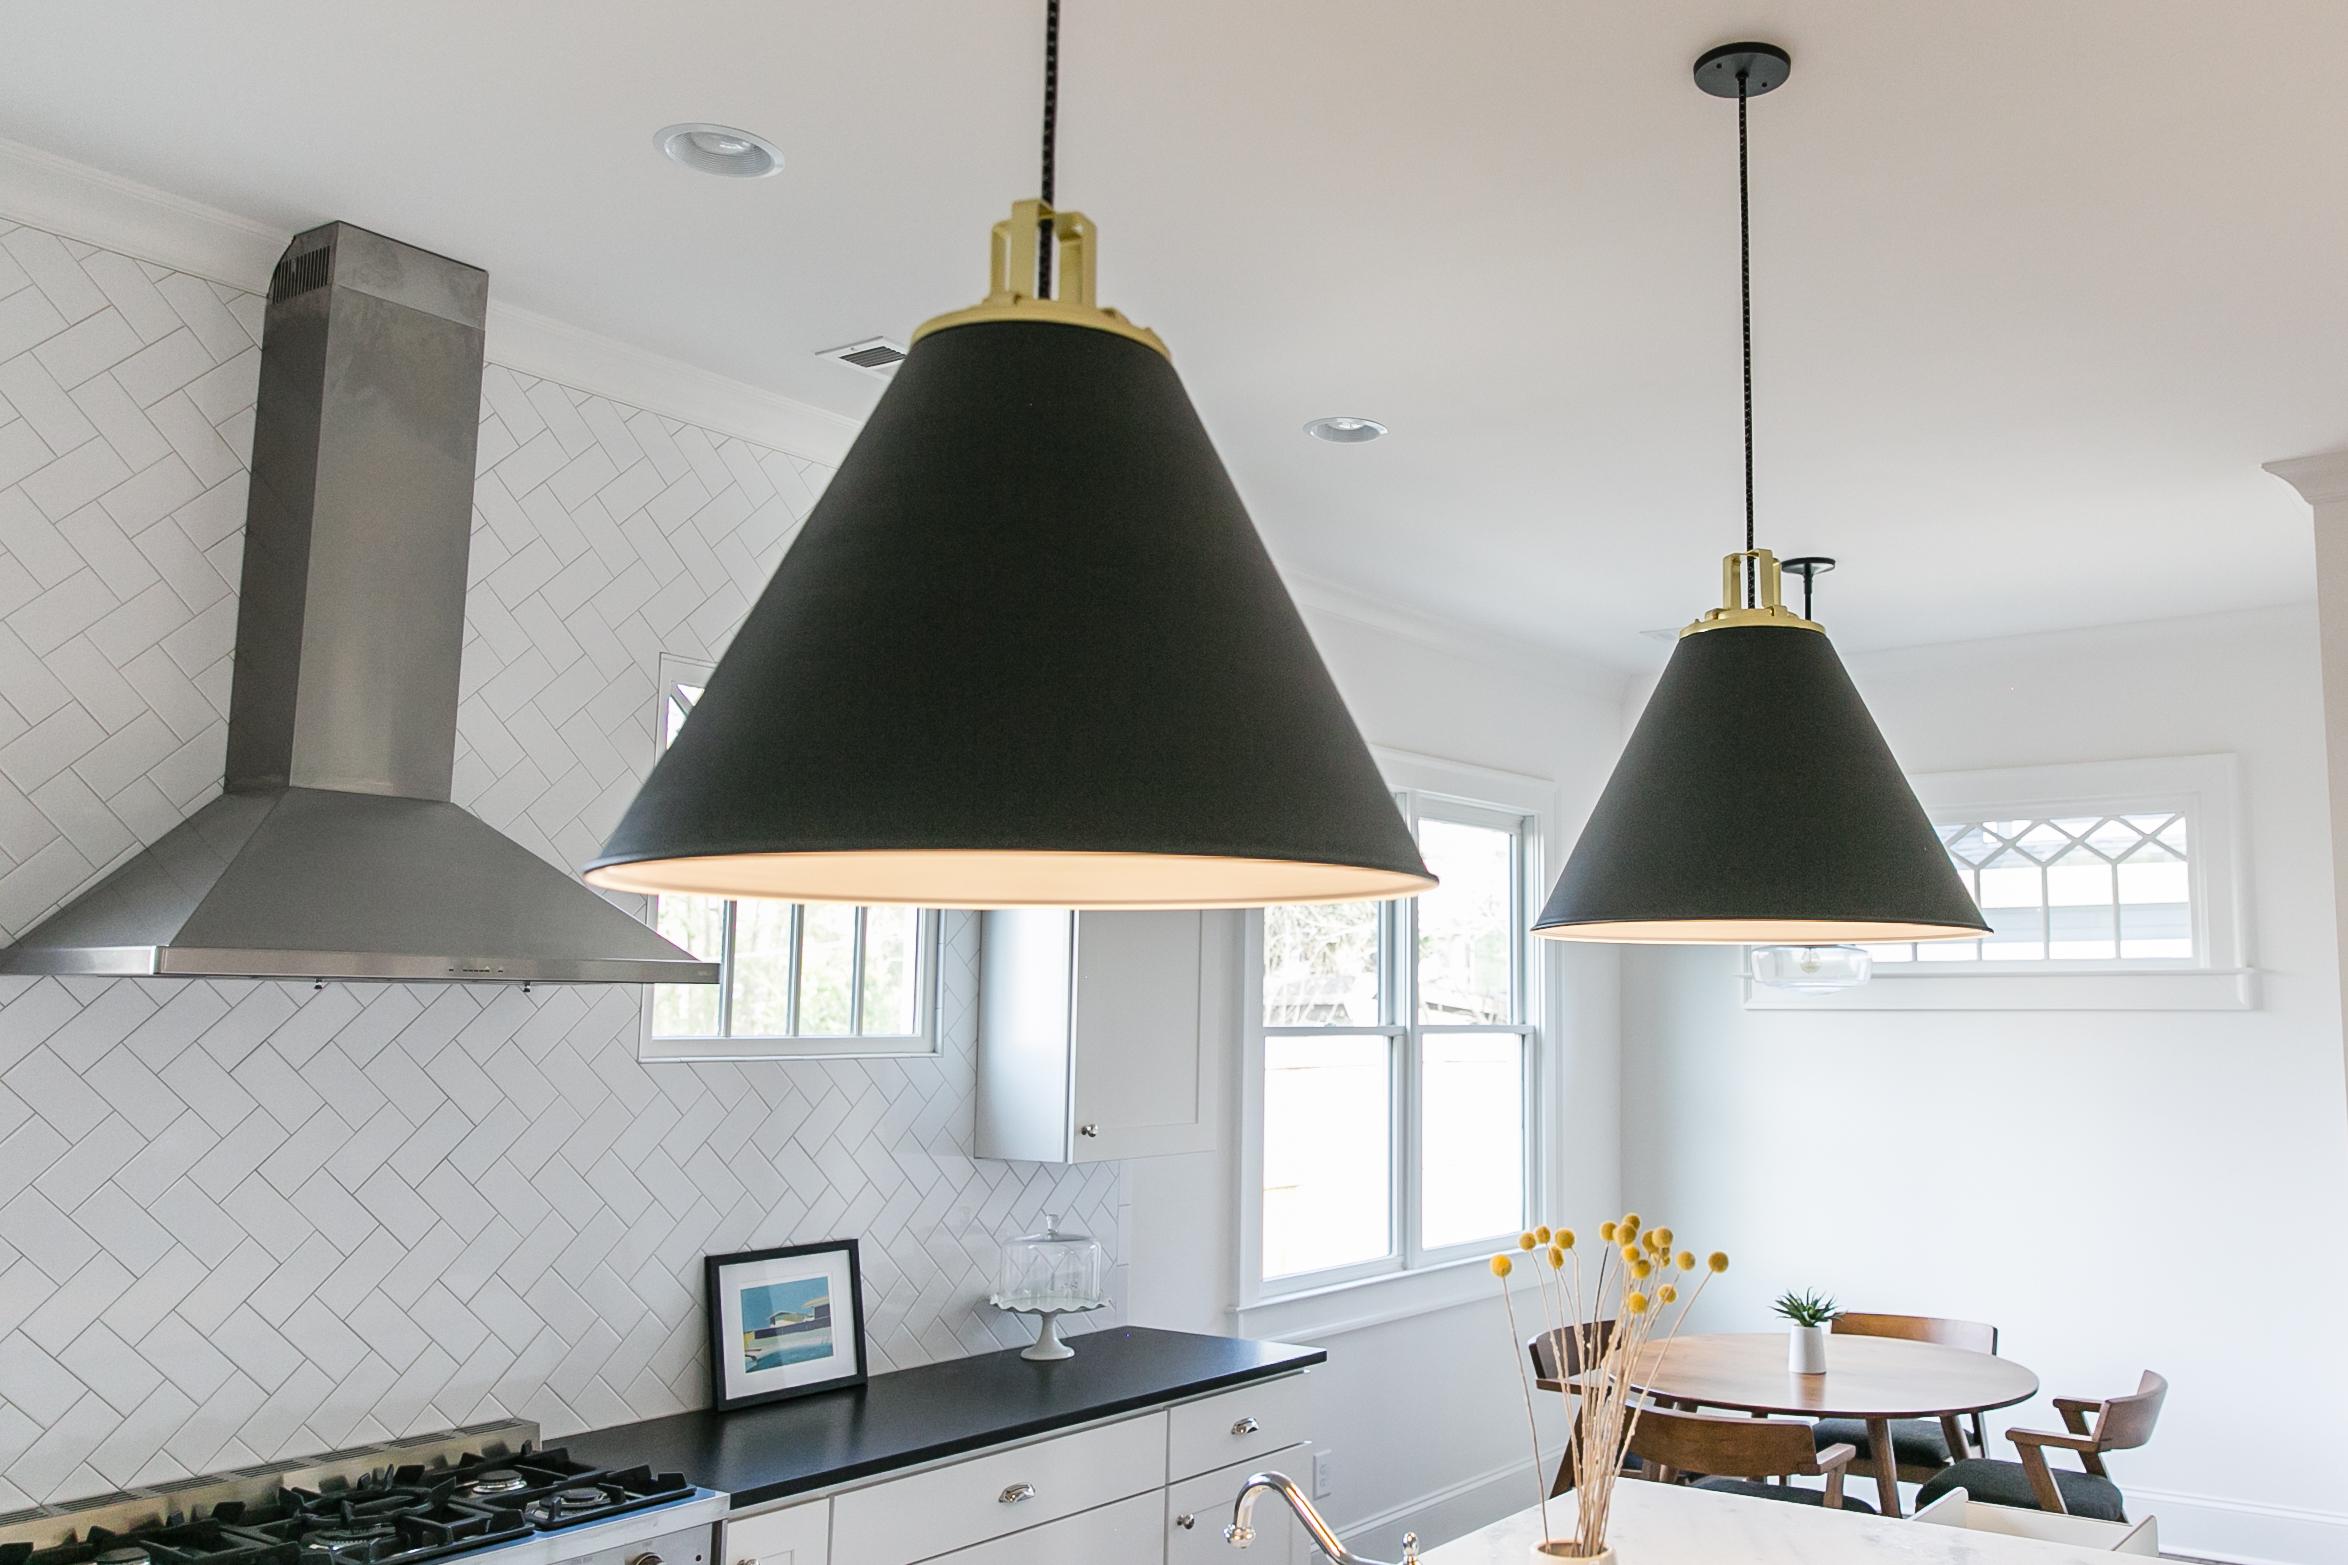 239 Greenwood-Kitchen Fixture.jpg